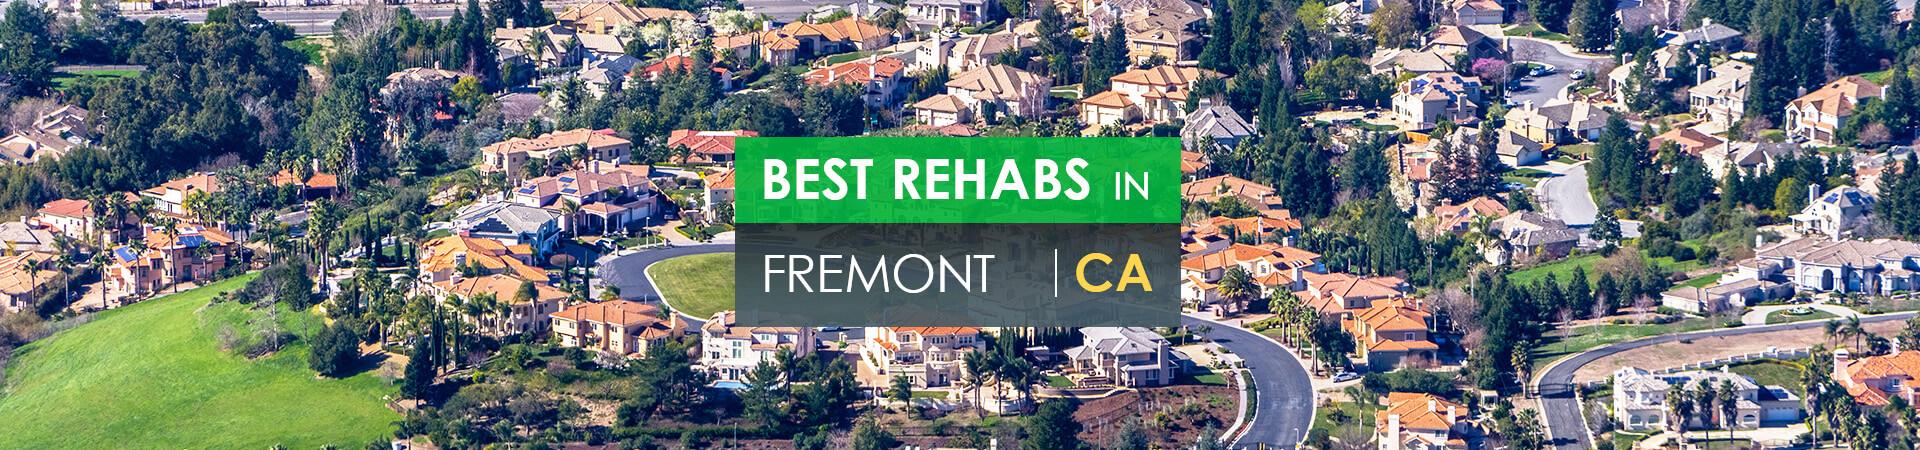 Best rehabs in Fremont, CA